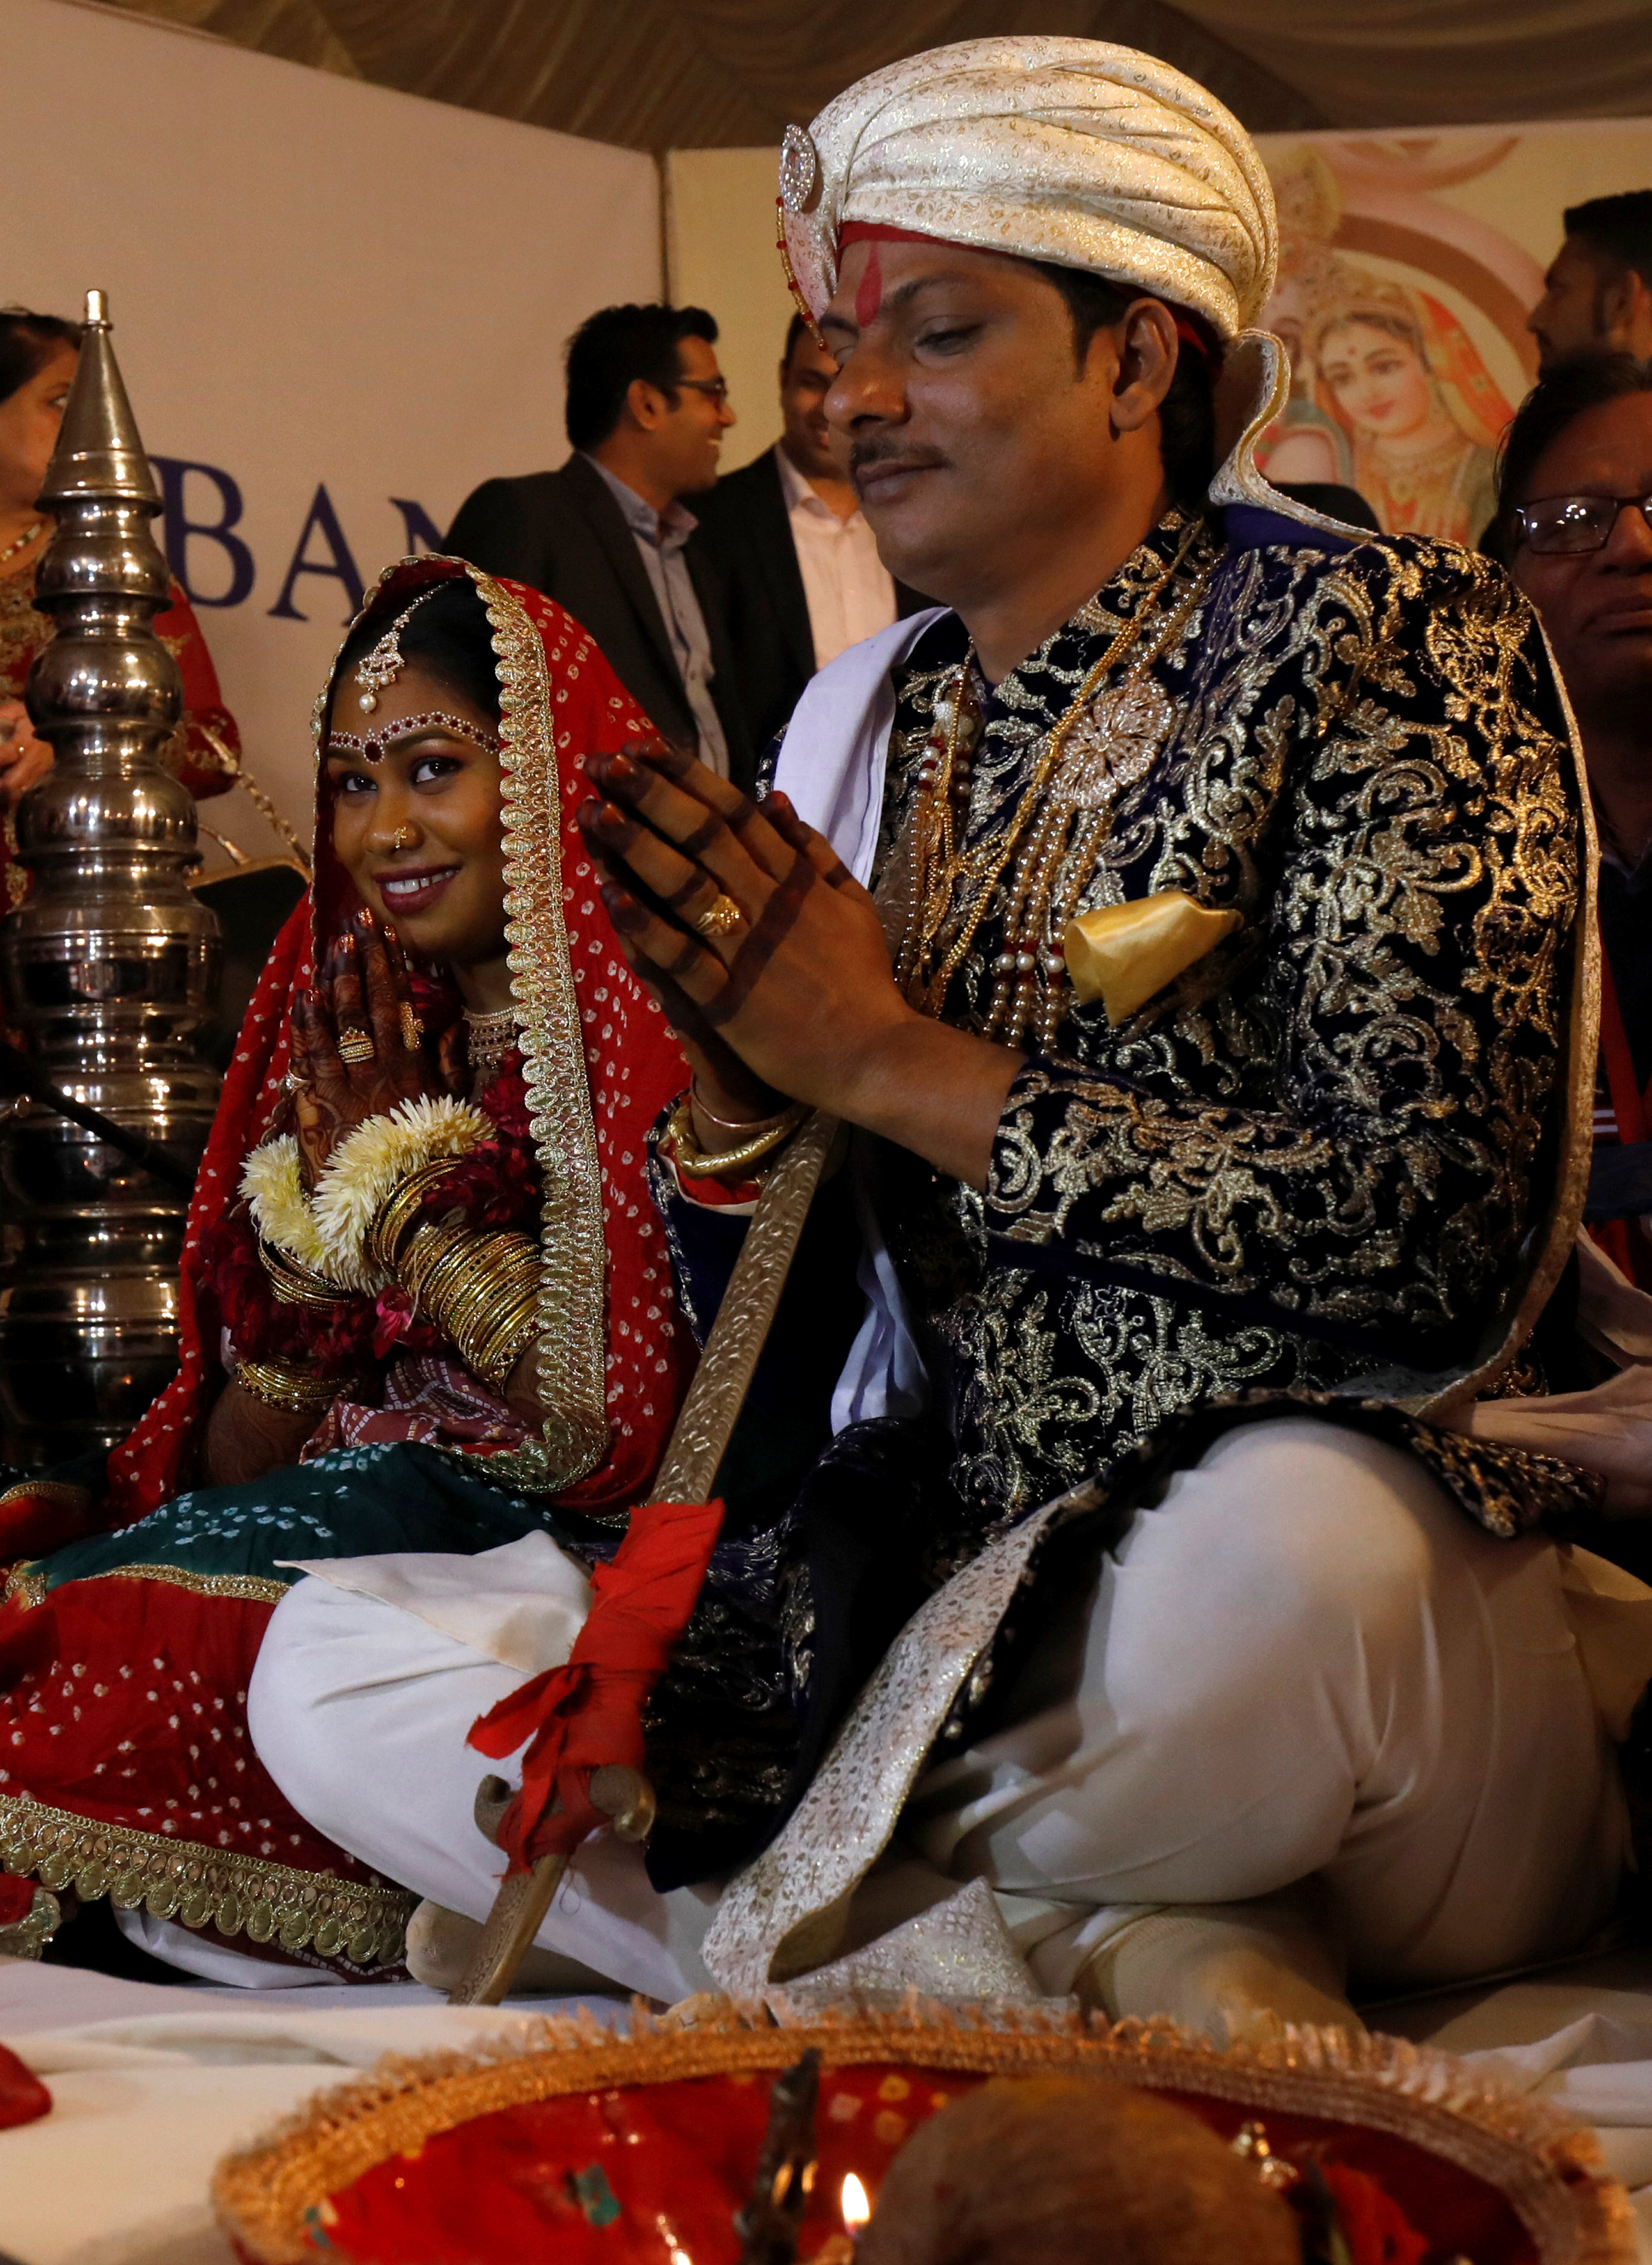 حفل زفاف جماعى للهندوس فى كراتشى (5)